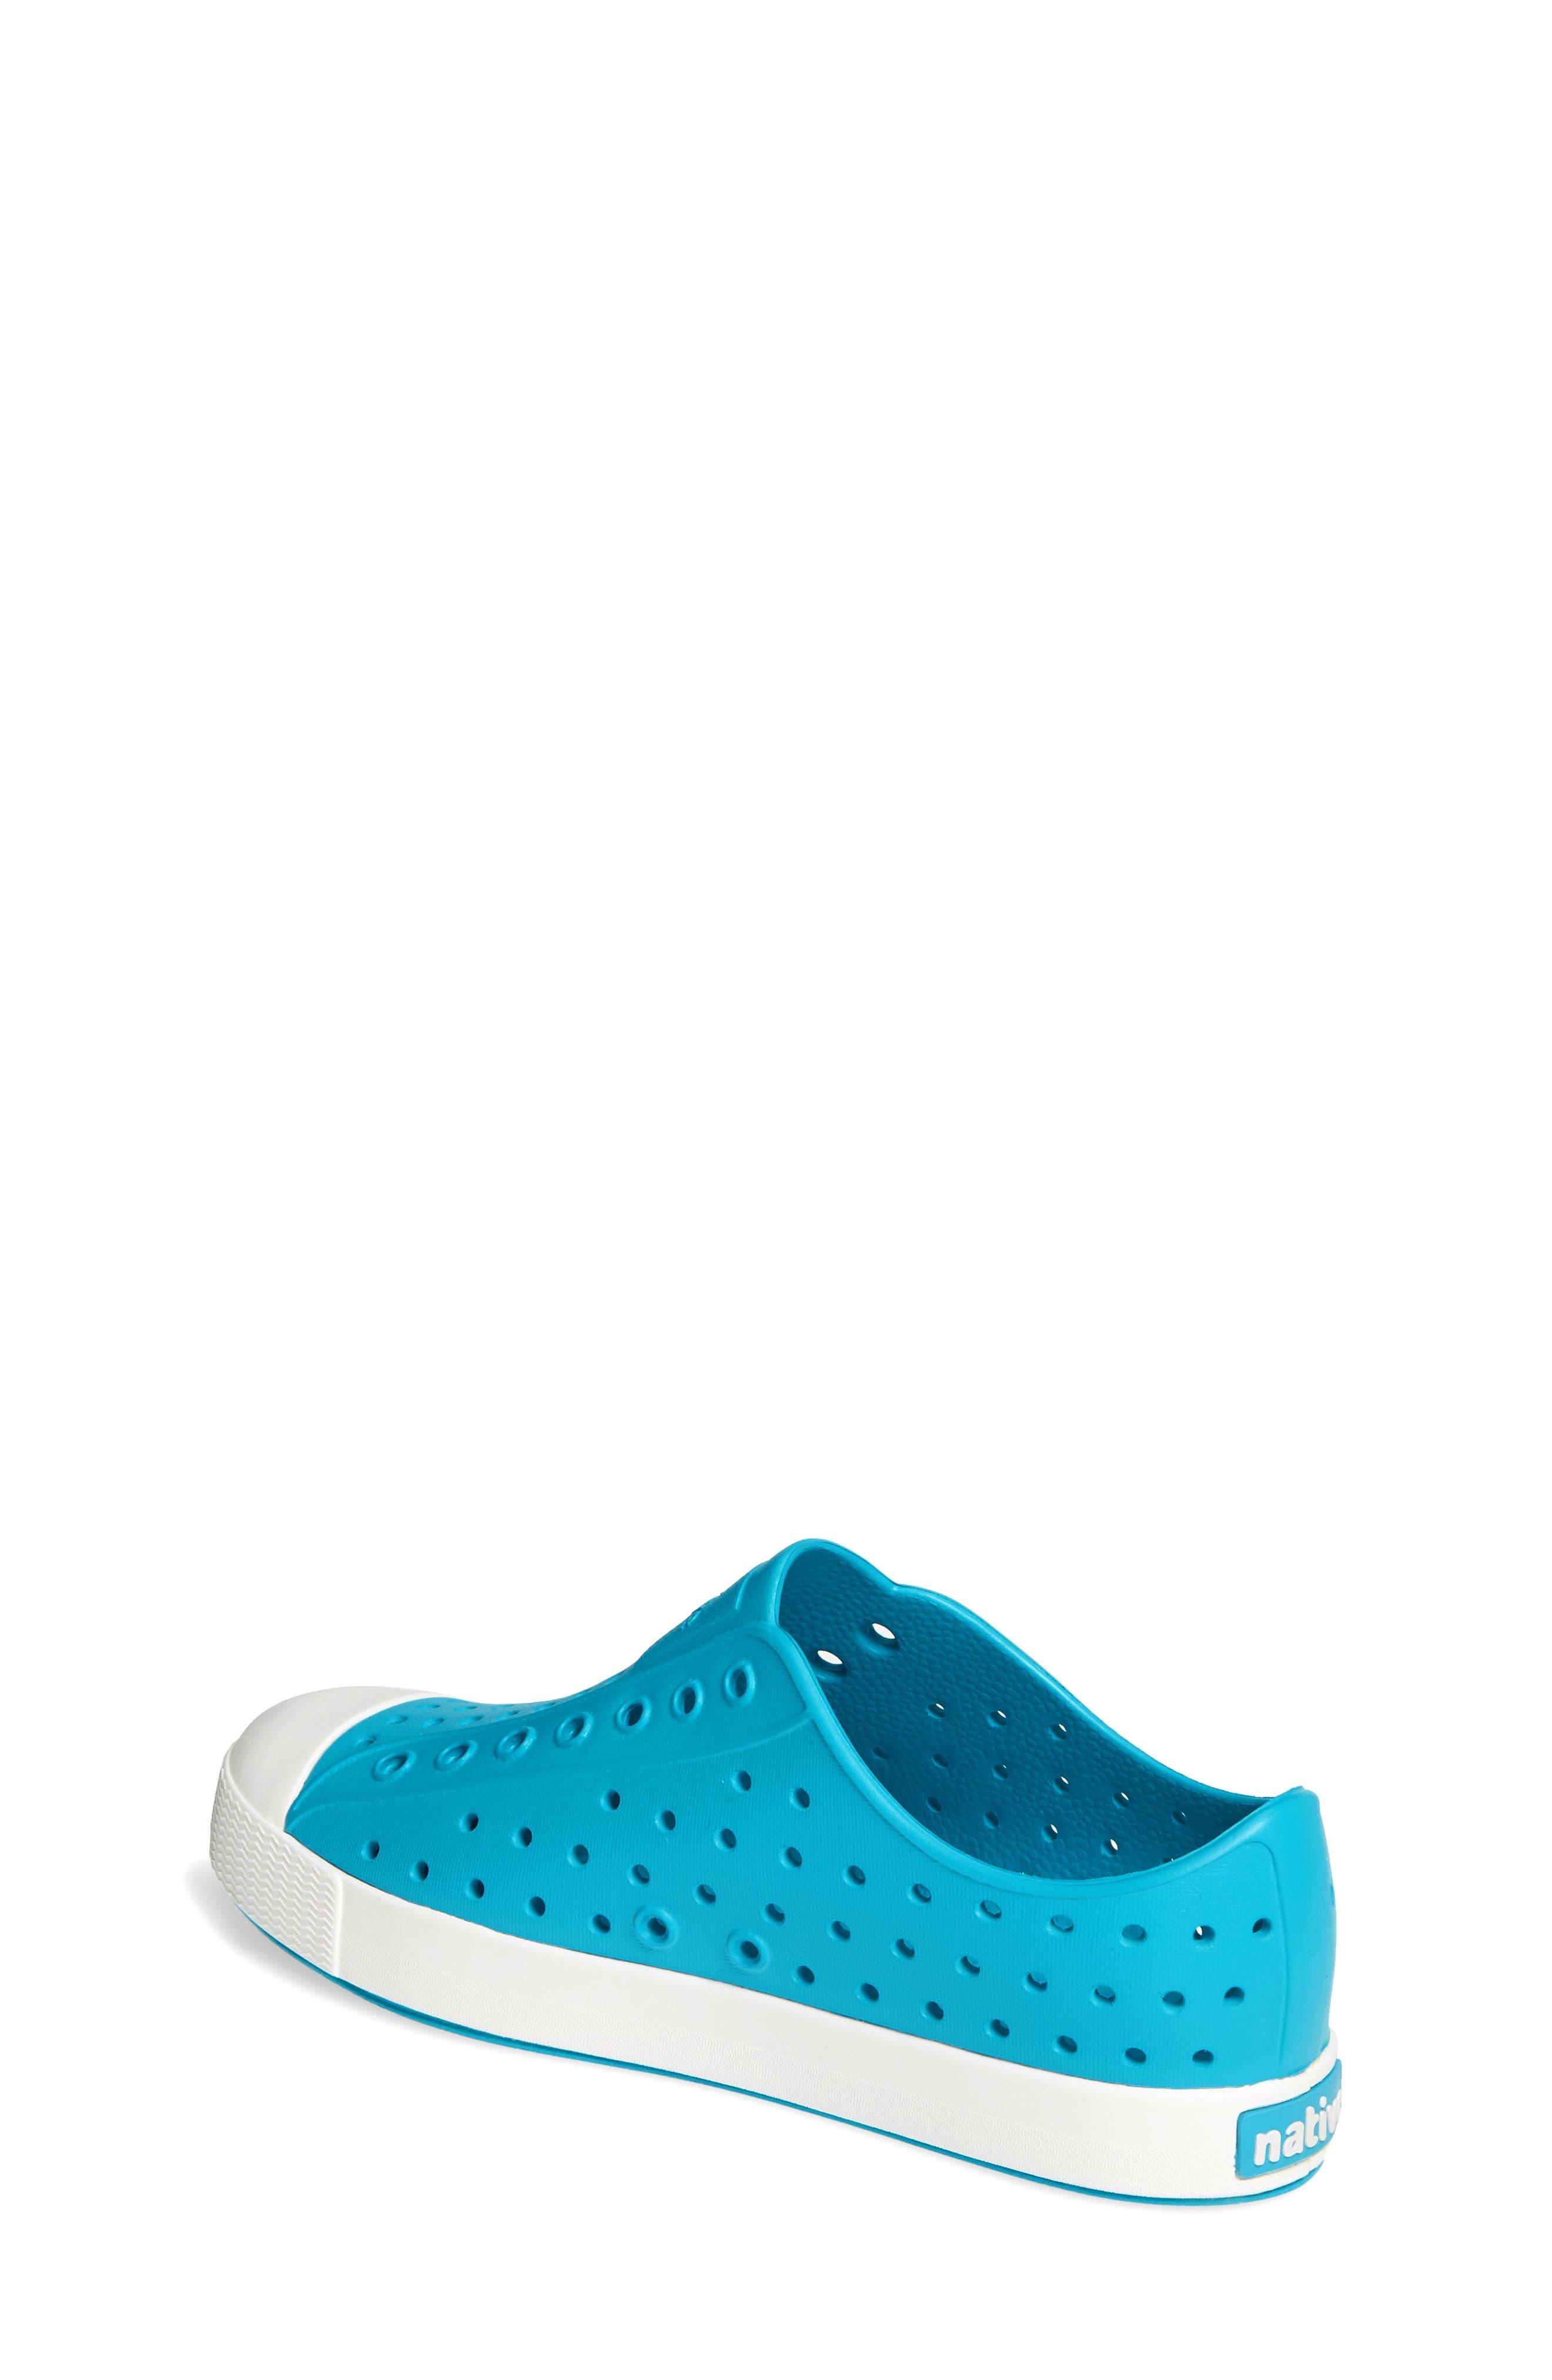 'Jefferson' Water Friendly Slip-On Sneaker,                             Alternate thumbnail 103, color,